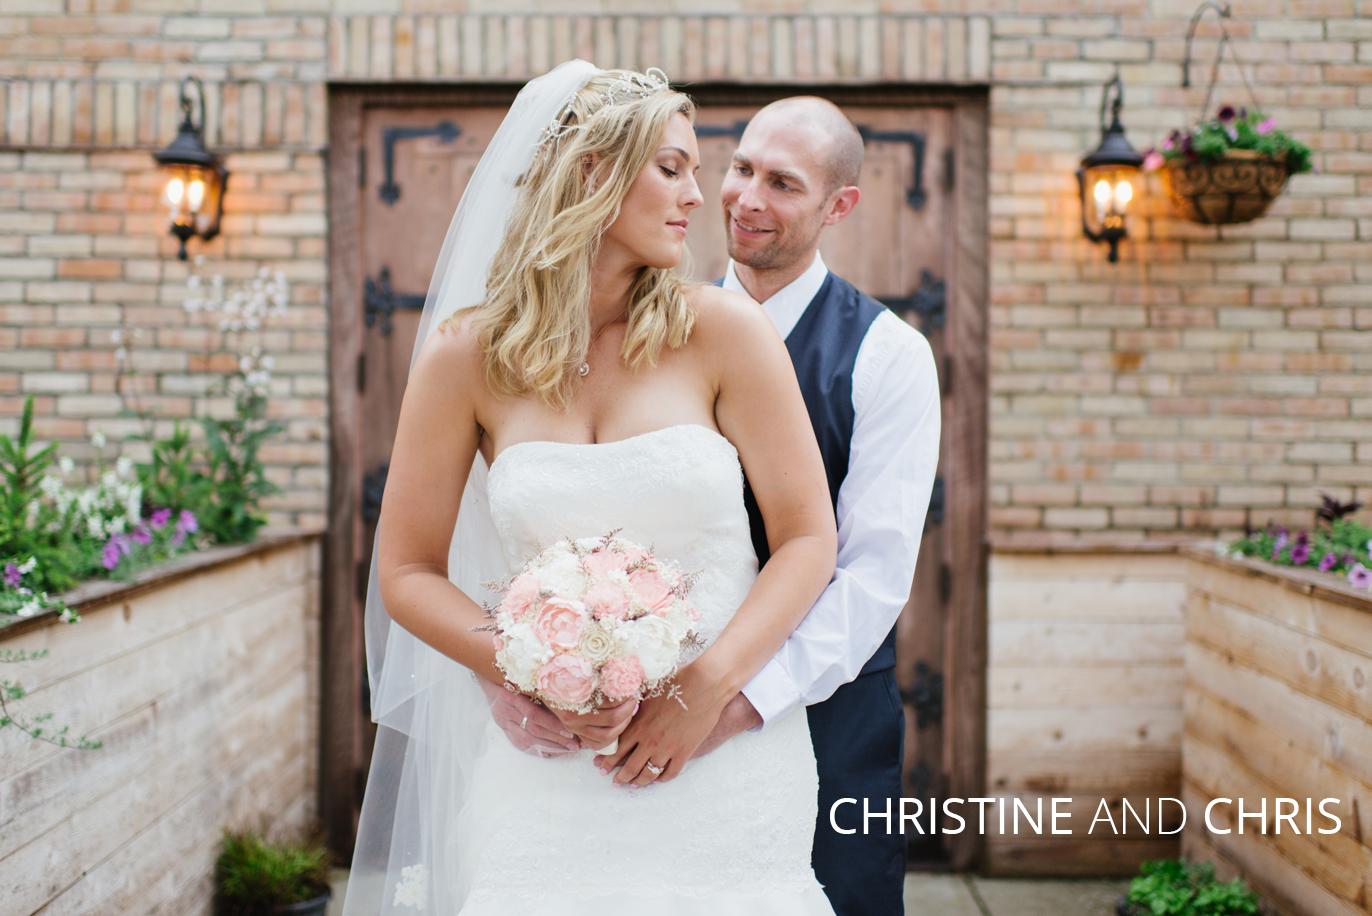 Christine and Chris rustic wedding